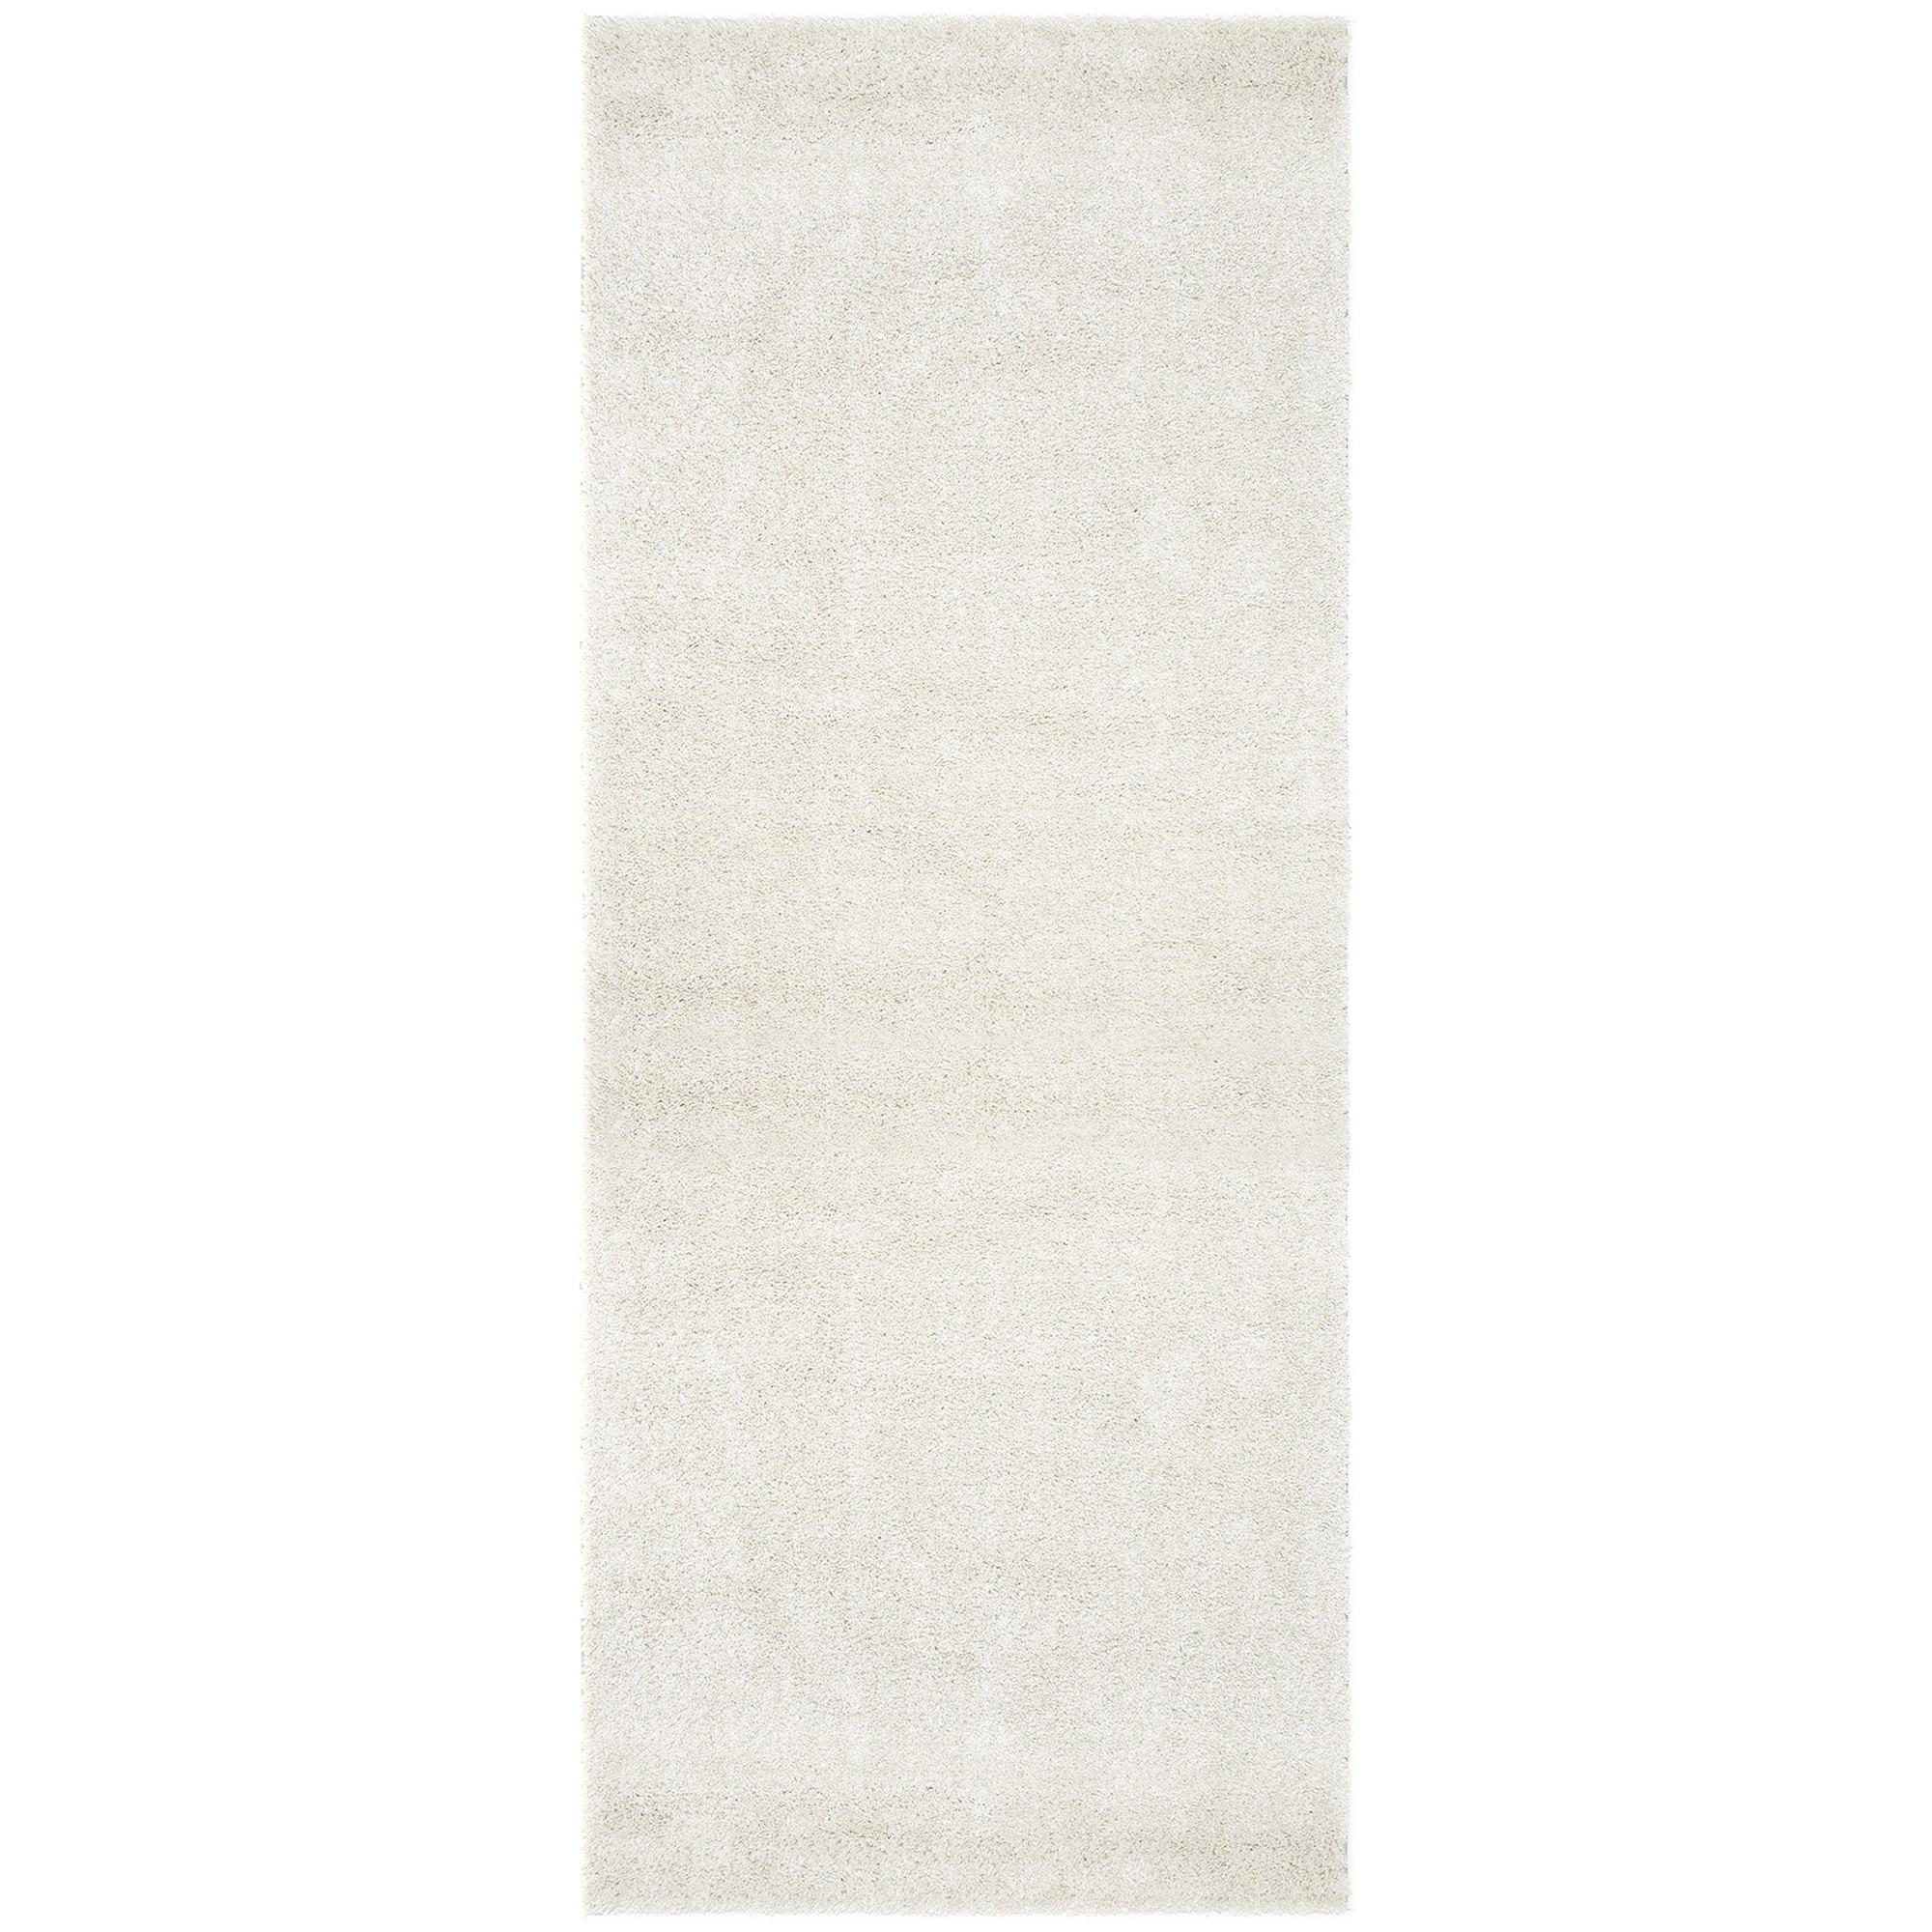 Siesta Plain Shaggy Runner Rug, 80x200cm, Cream